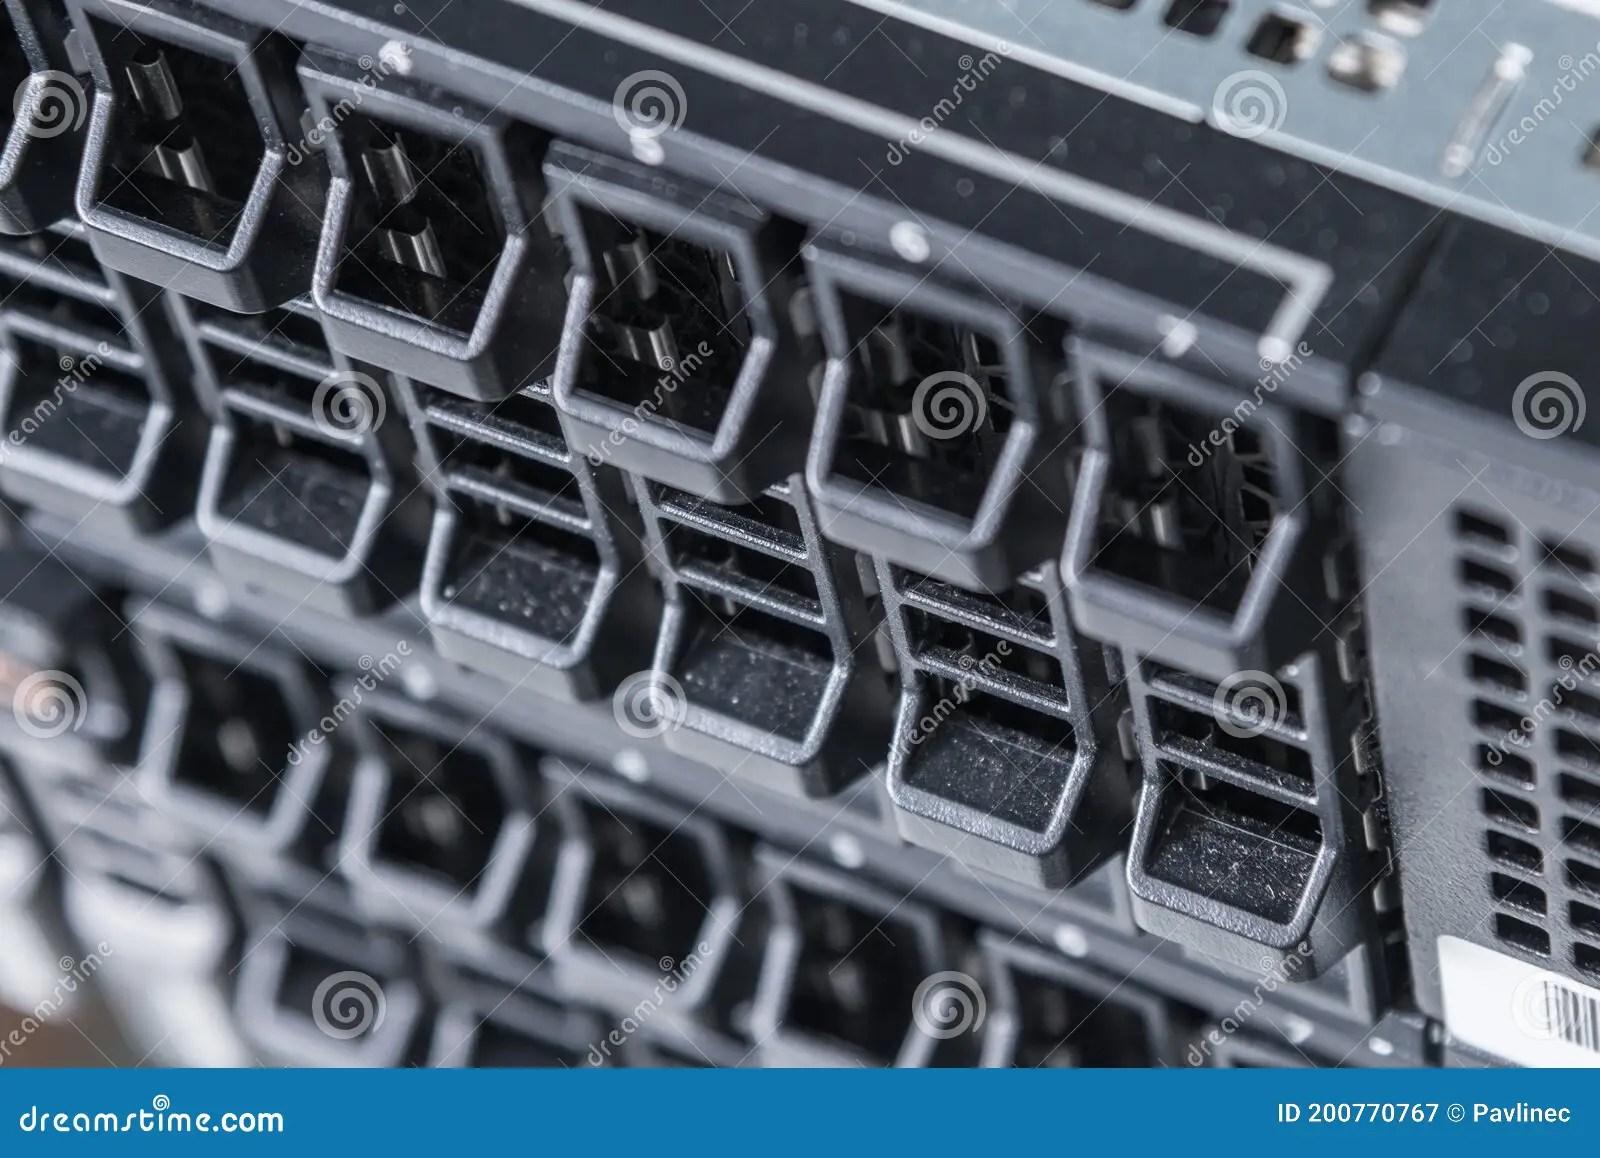 cluster of data storage ssd hard drives inside server rack stock image image of data modern 200770767